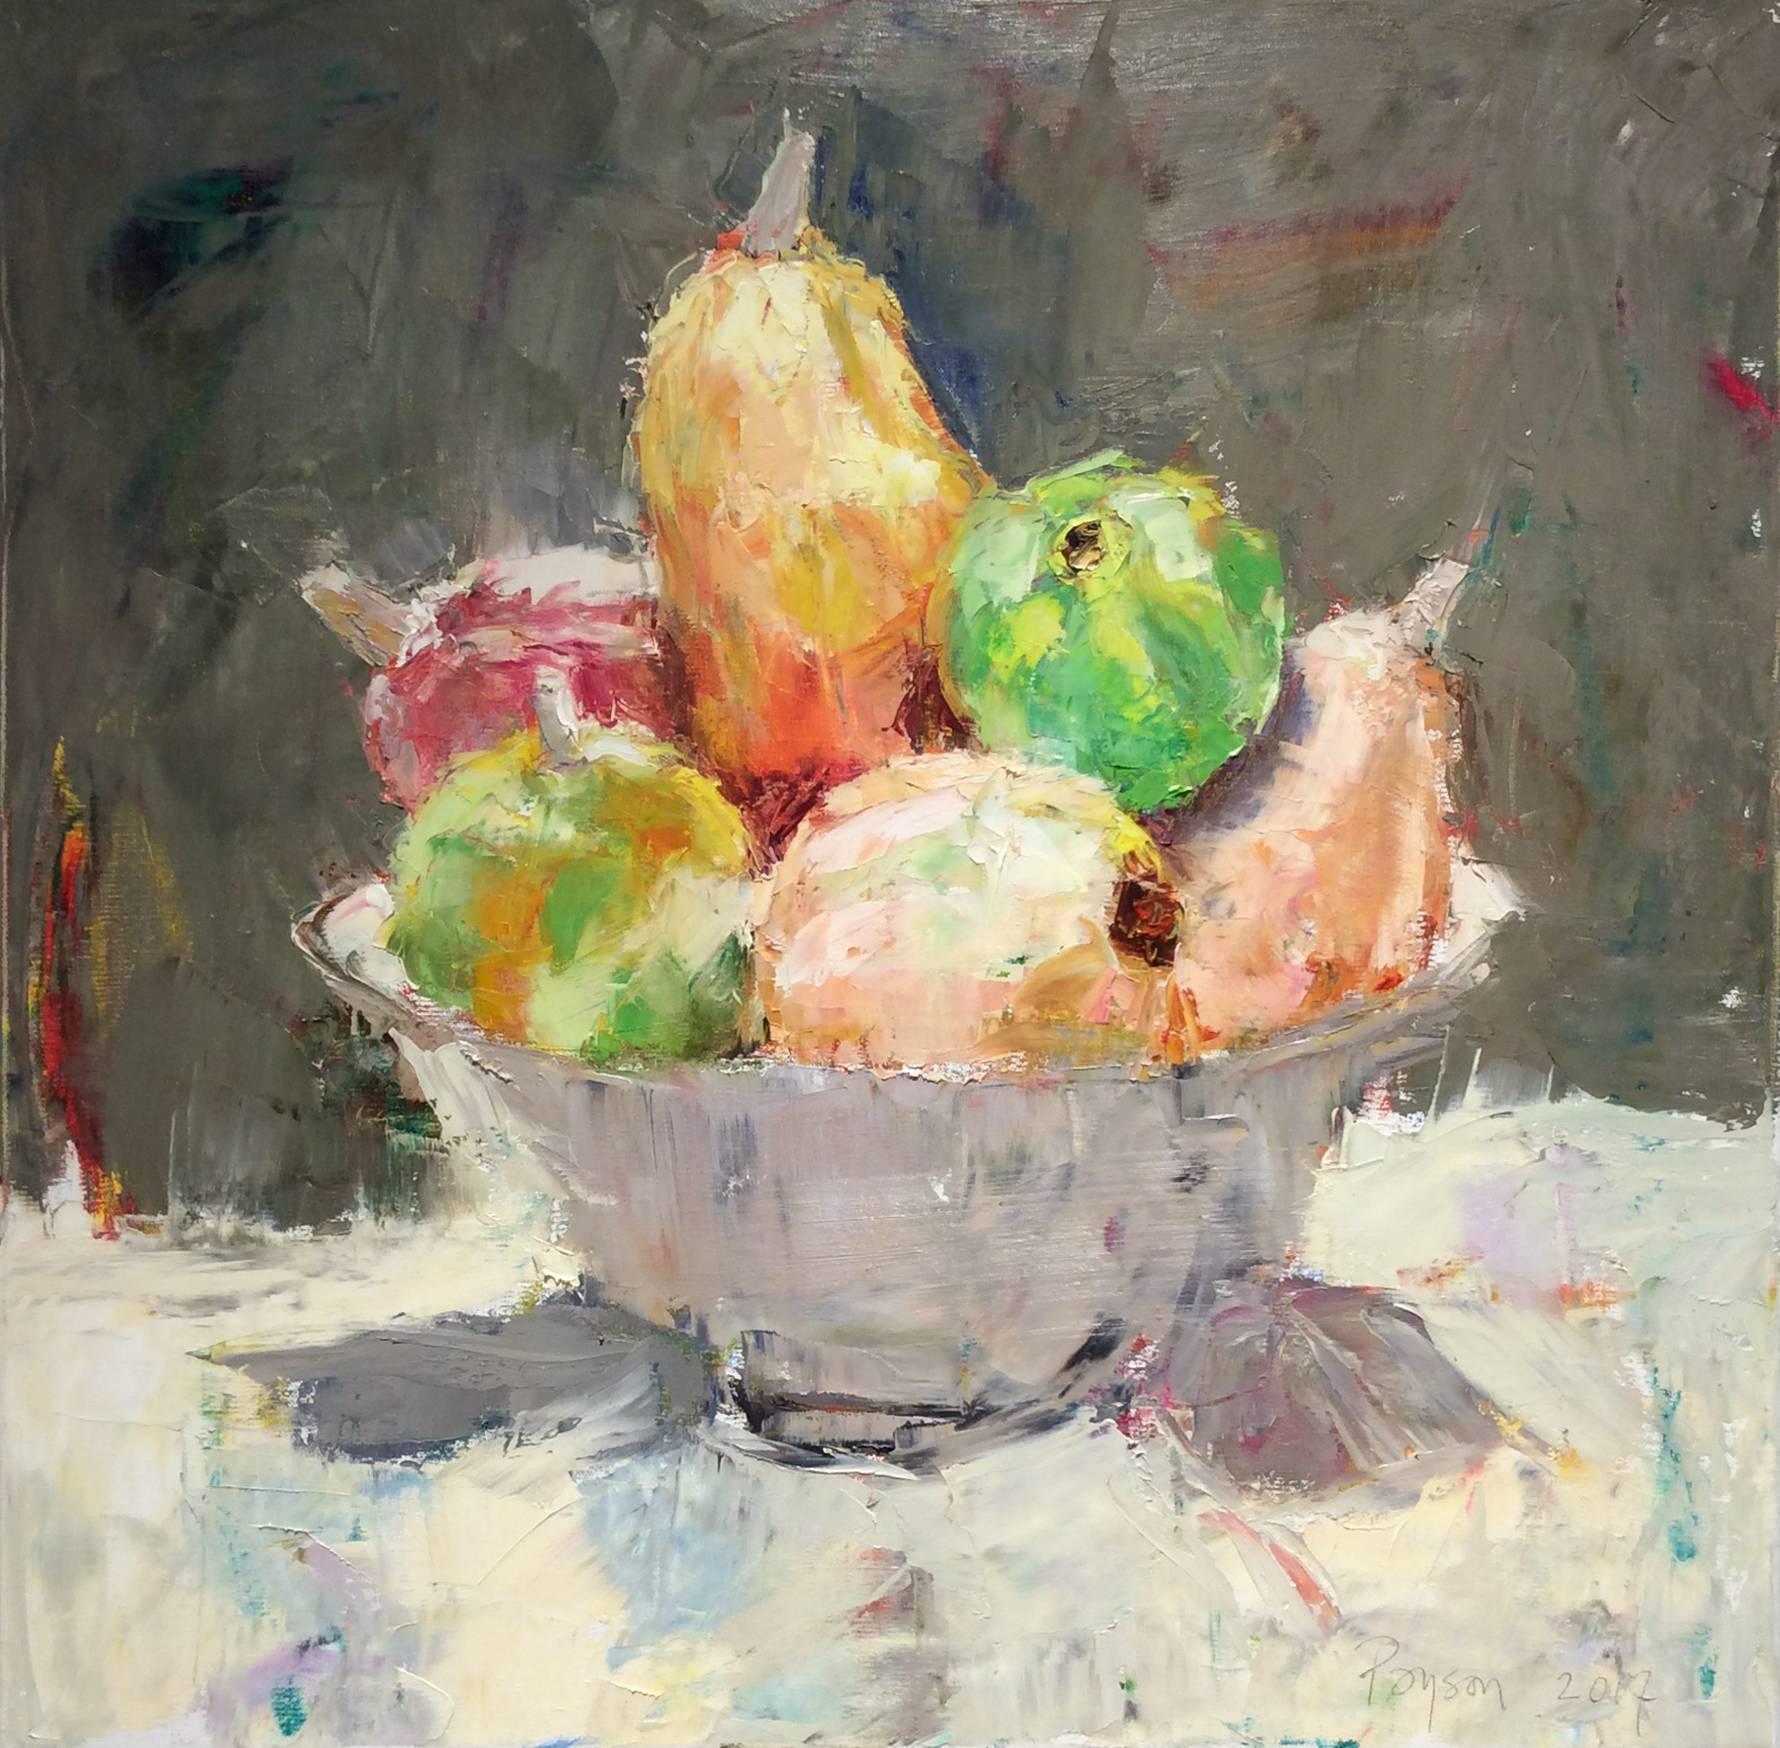 Fruit Bowl Still Life II (Square Still Life Oil Painting on Canvas)